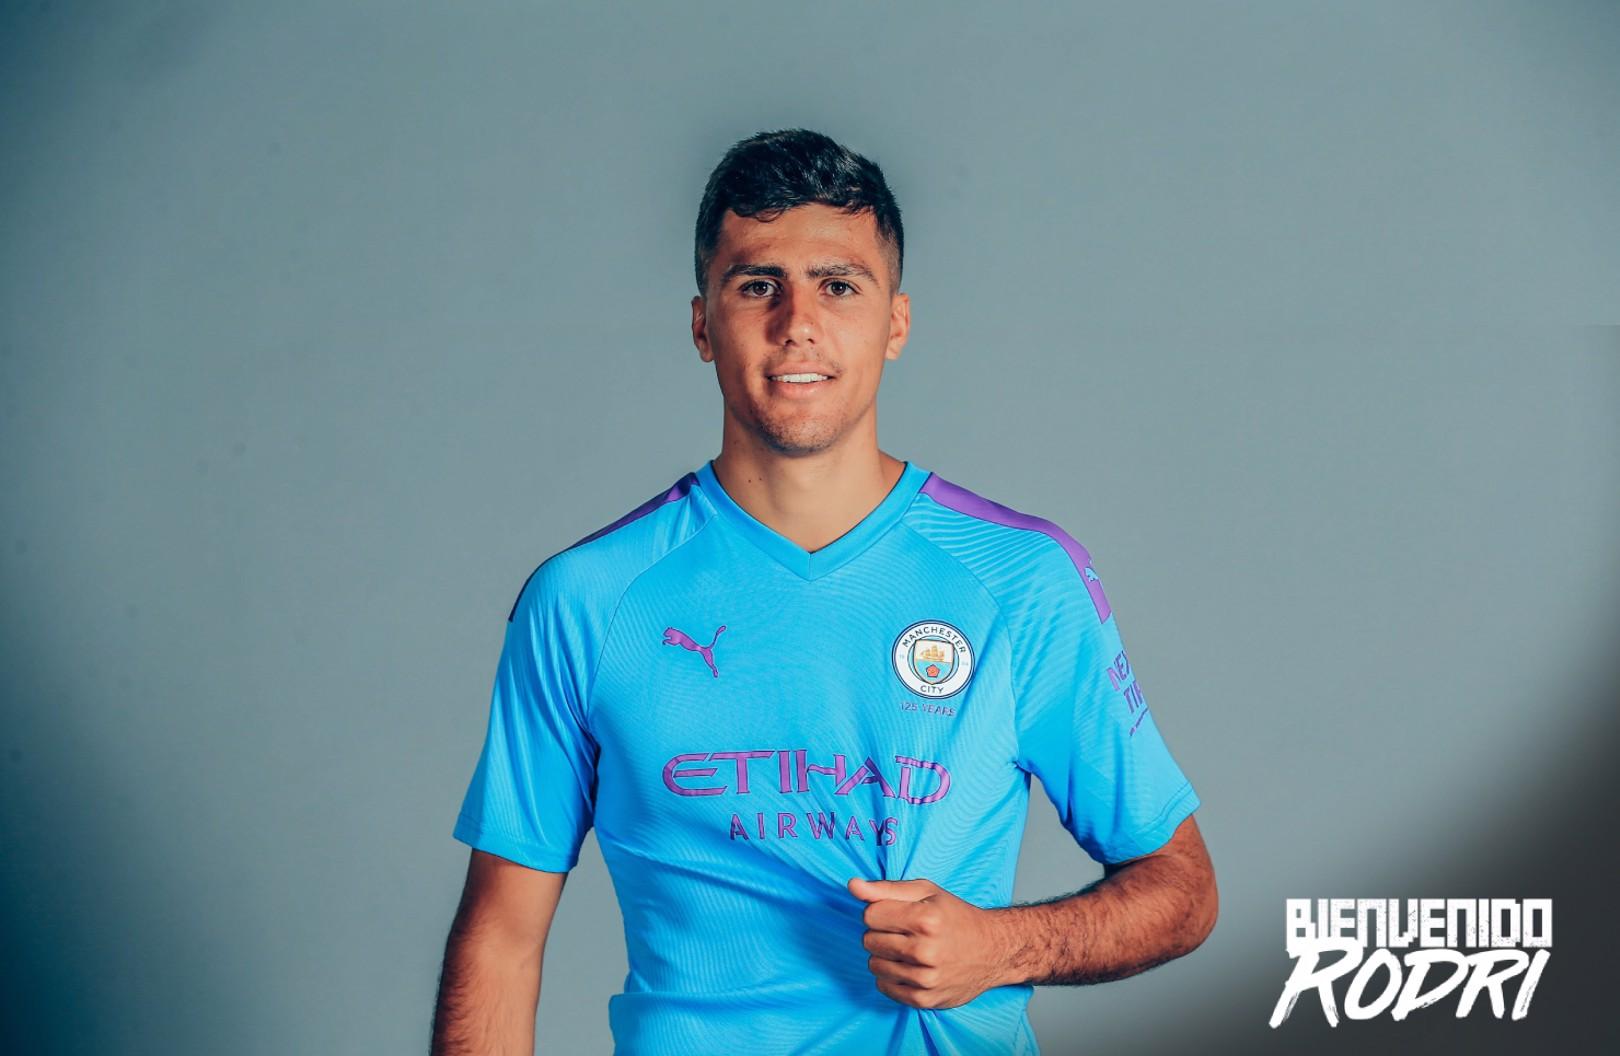 Rodri con su nueva camiseta, la del Manchester City.